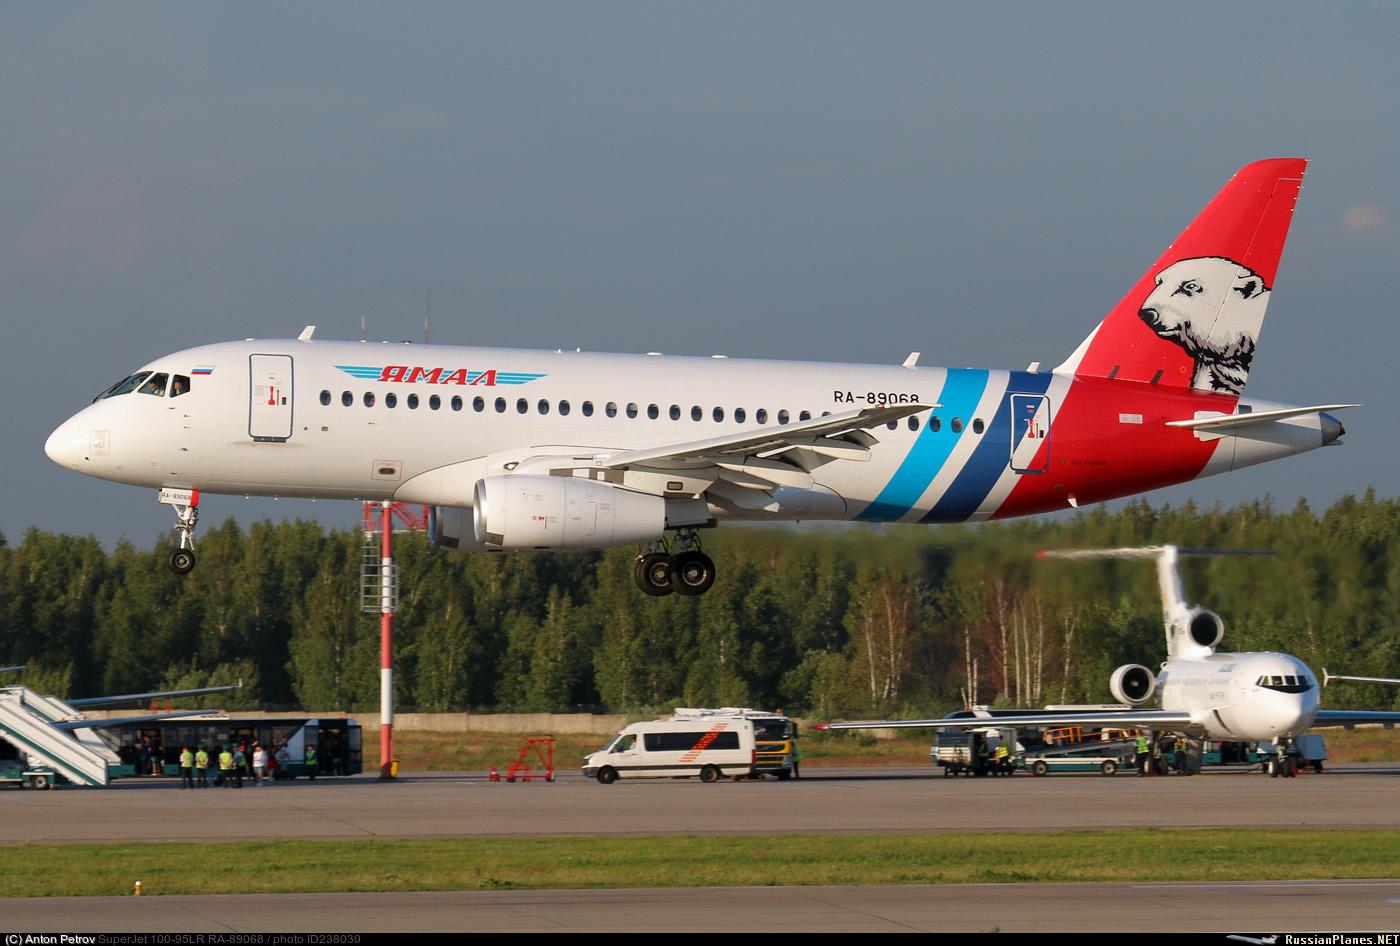 Sukhoi Superjet-100 RA-89068 (95109)